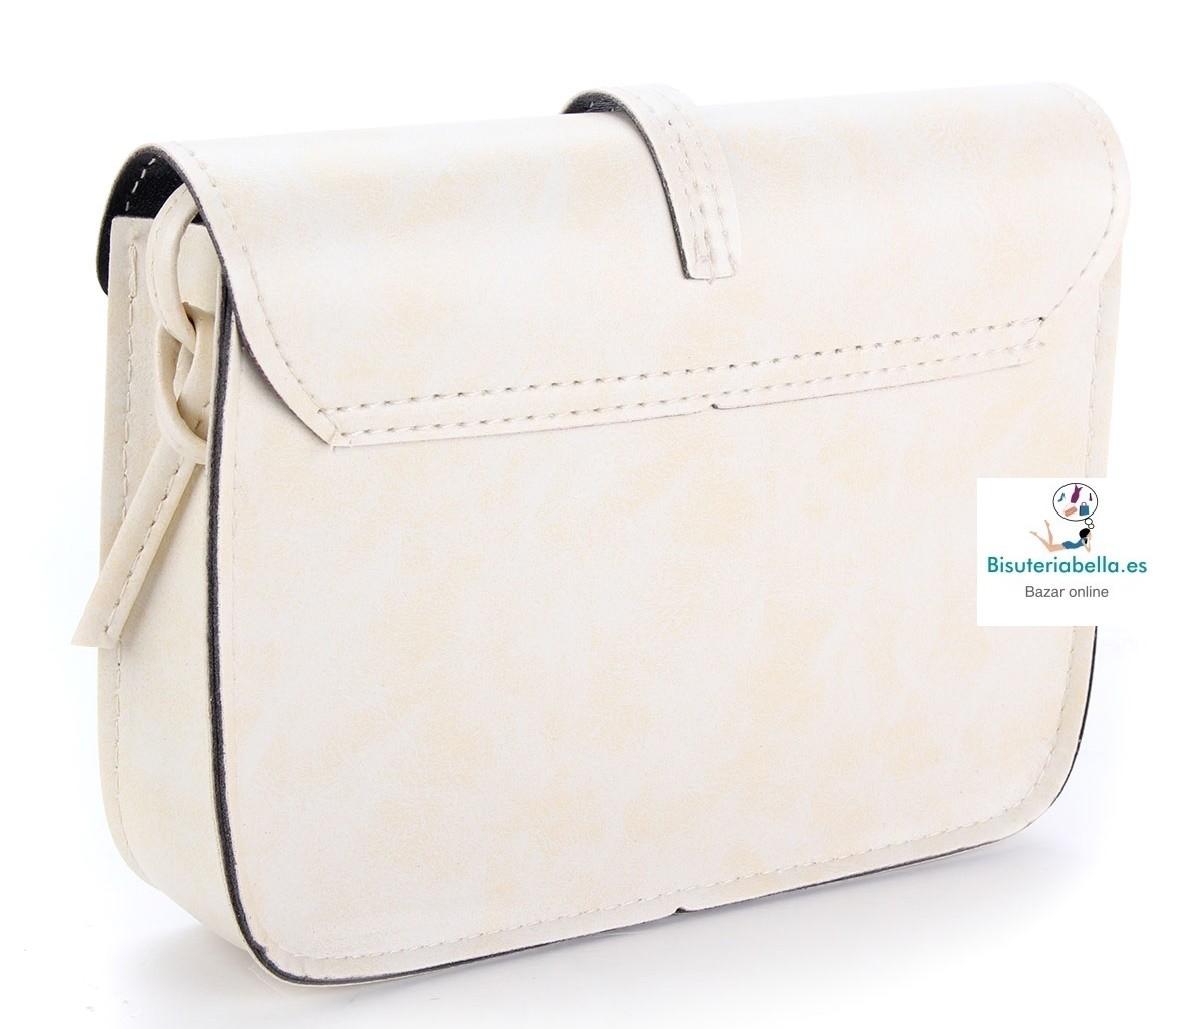 Mini-Bolso Polipiel fino y elegante varios tonos a elegir